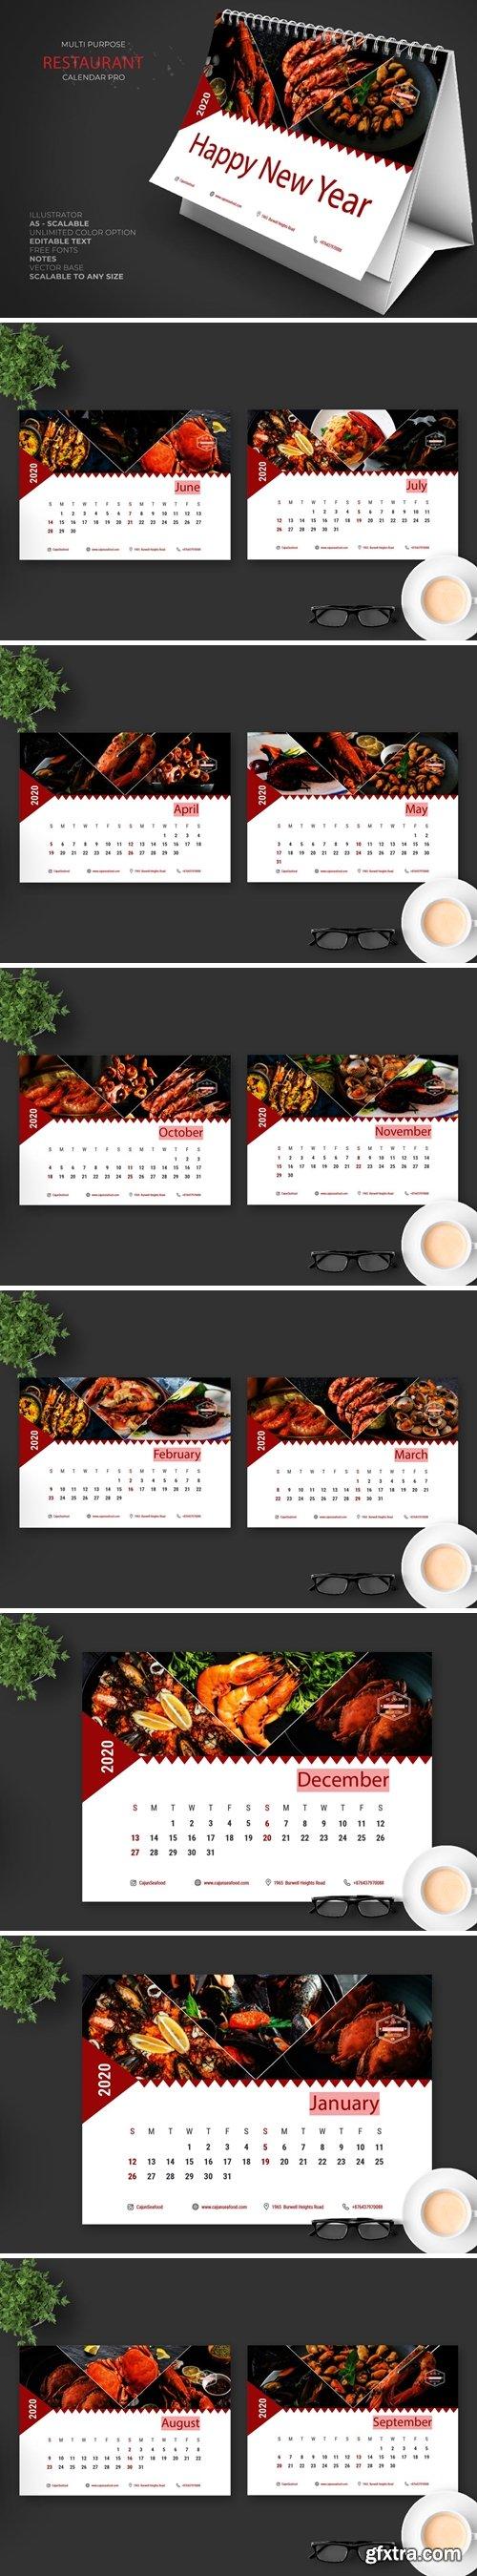 2020 Seafood Restaurant Calendar Pro